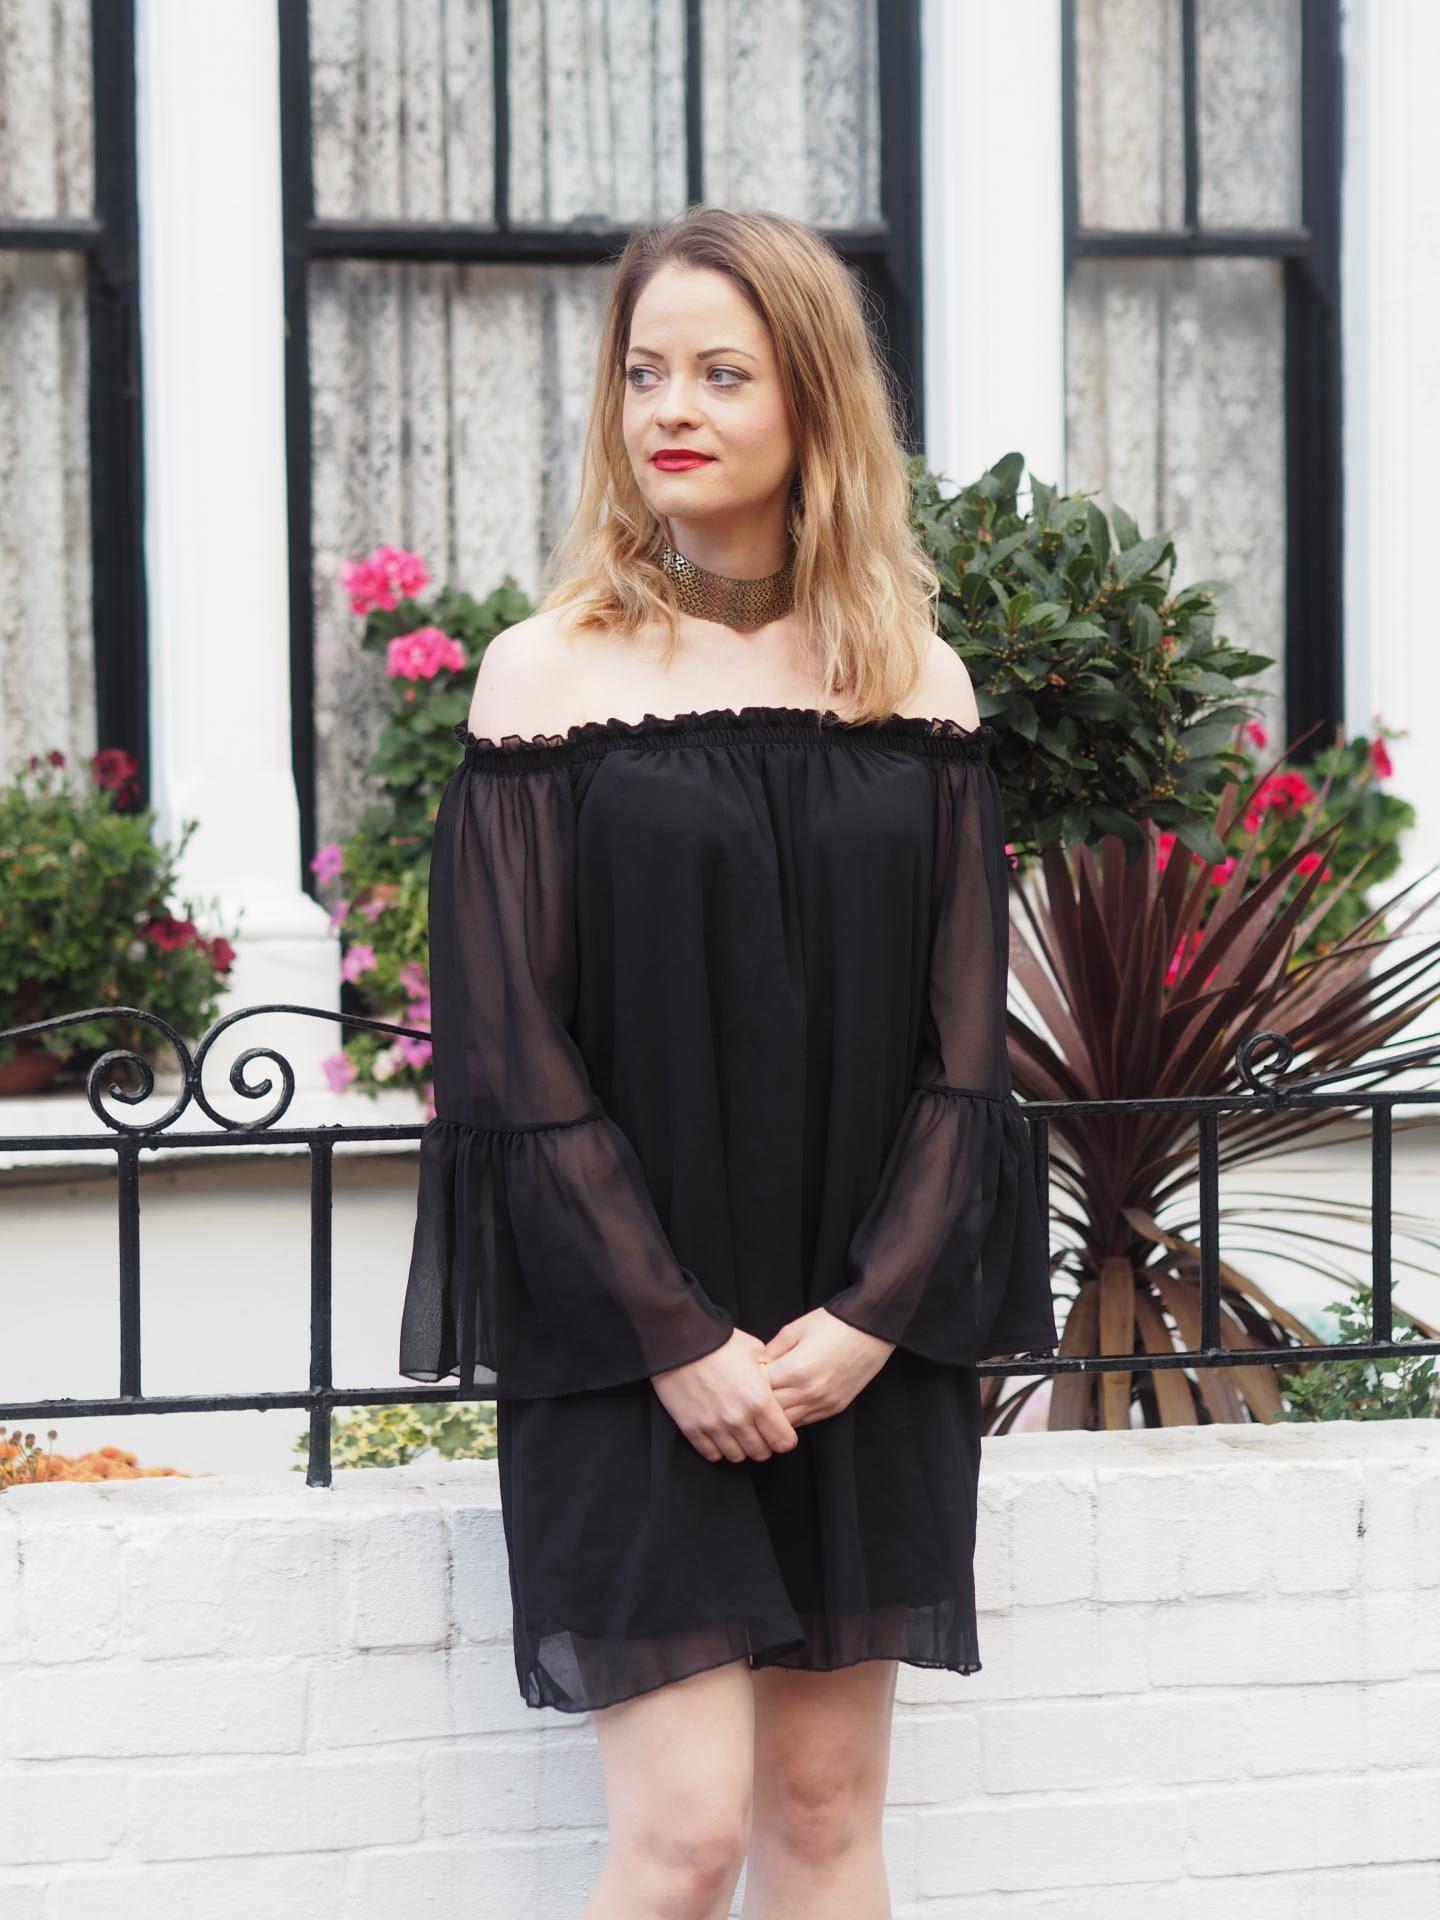 Bell Sleeve Bardot dress from Set Trendz